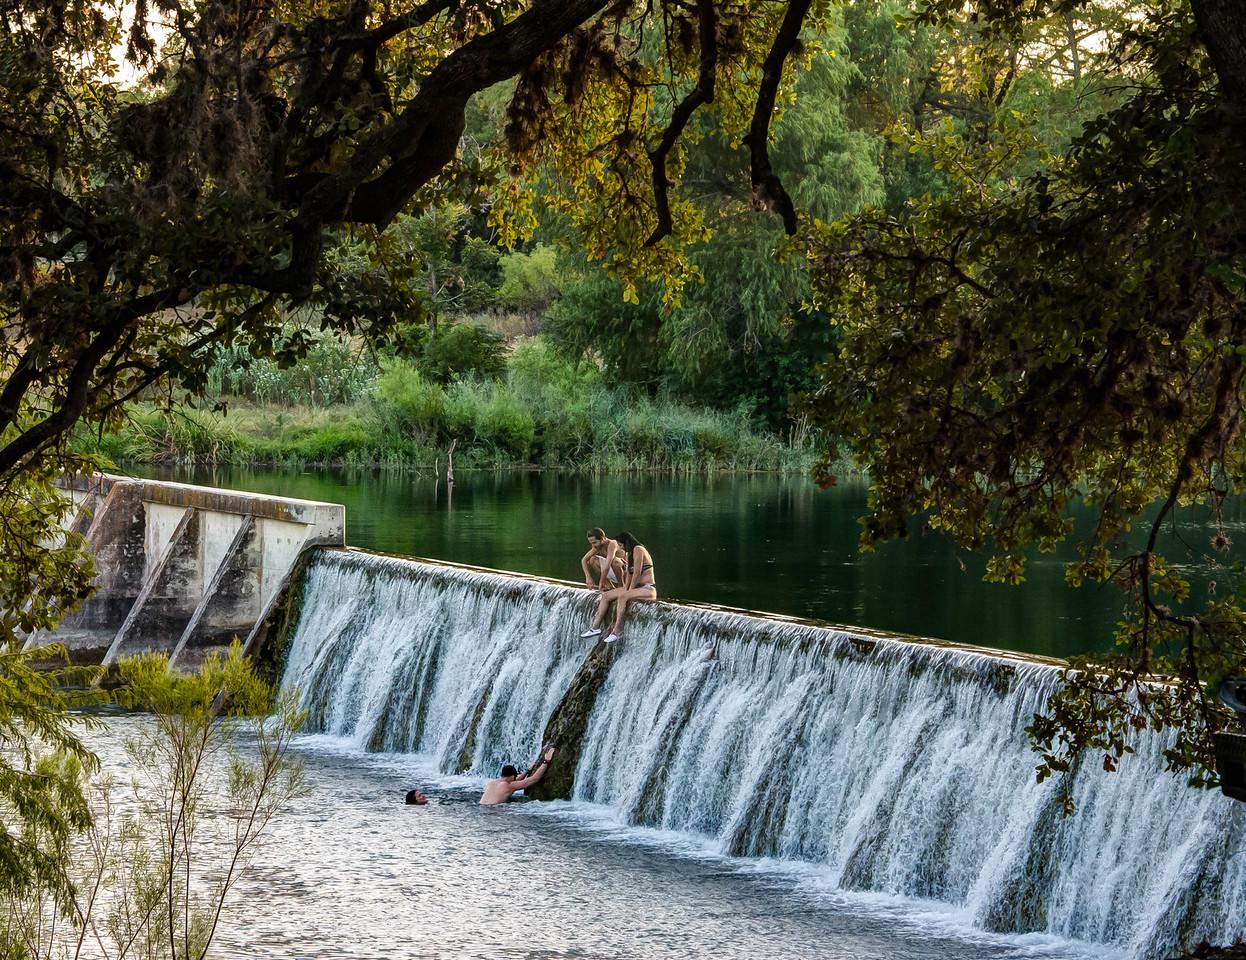 The Sabinal River in Utopia Park